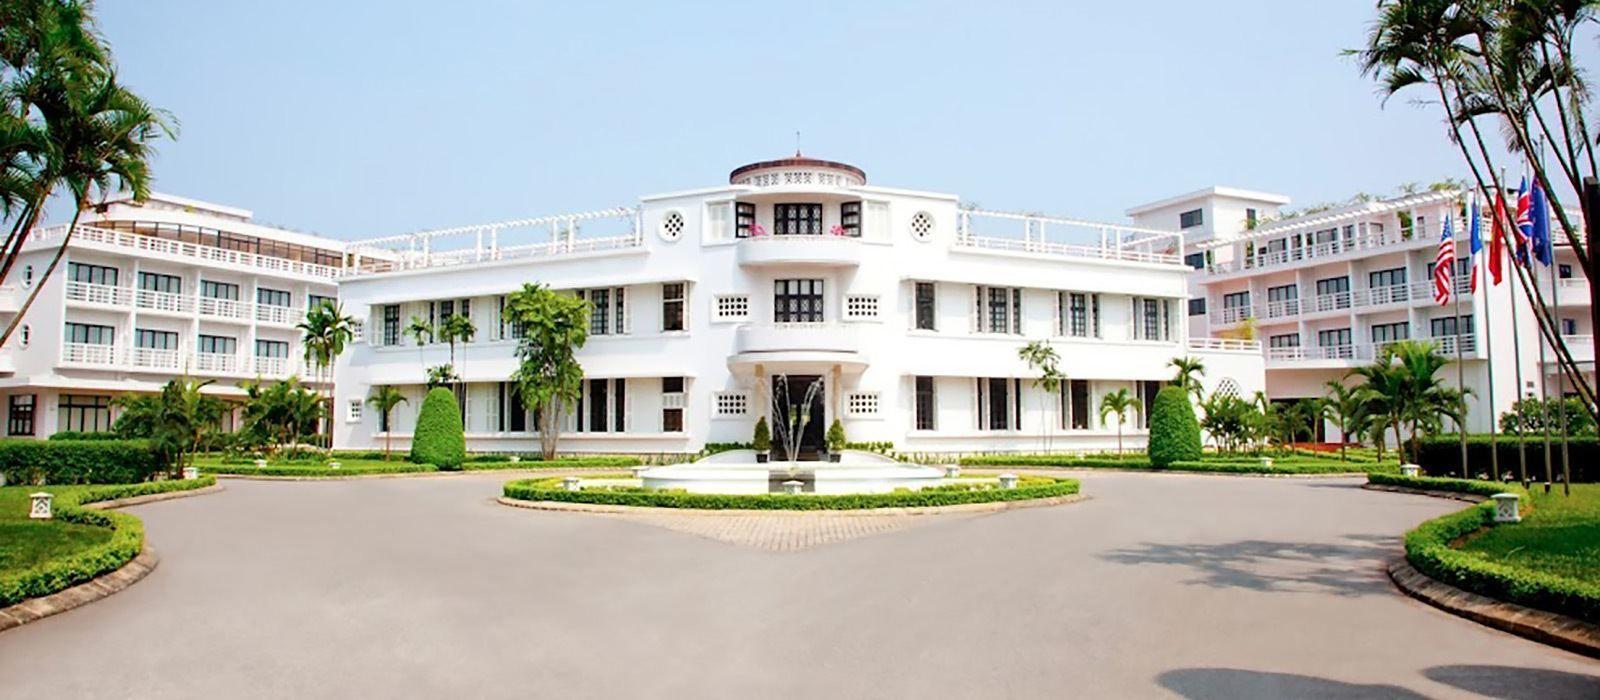 Hotel La Résidence Hôtel (Hué) Vietnam